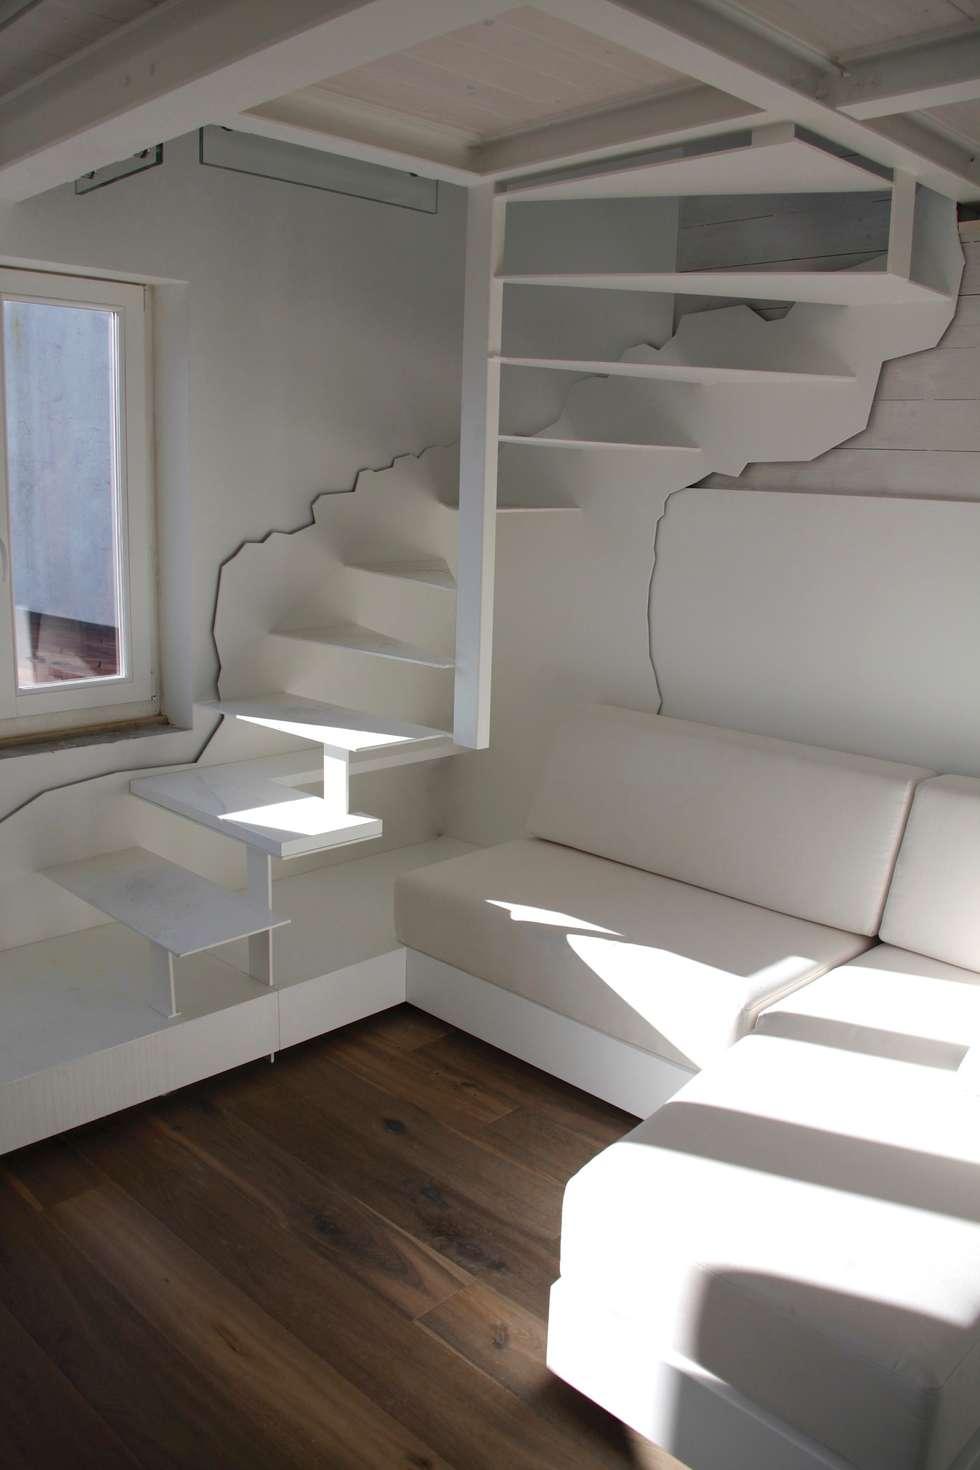 Scala in acciaio: Ingresso & Corridoio in stile  di Mangodesign